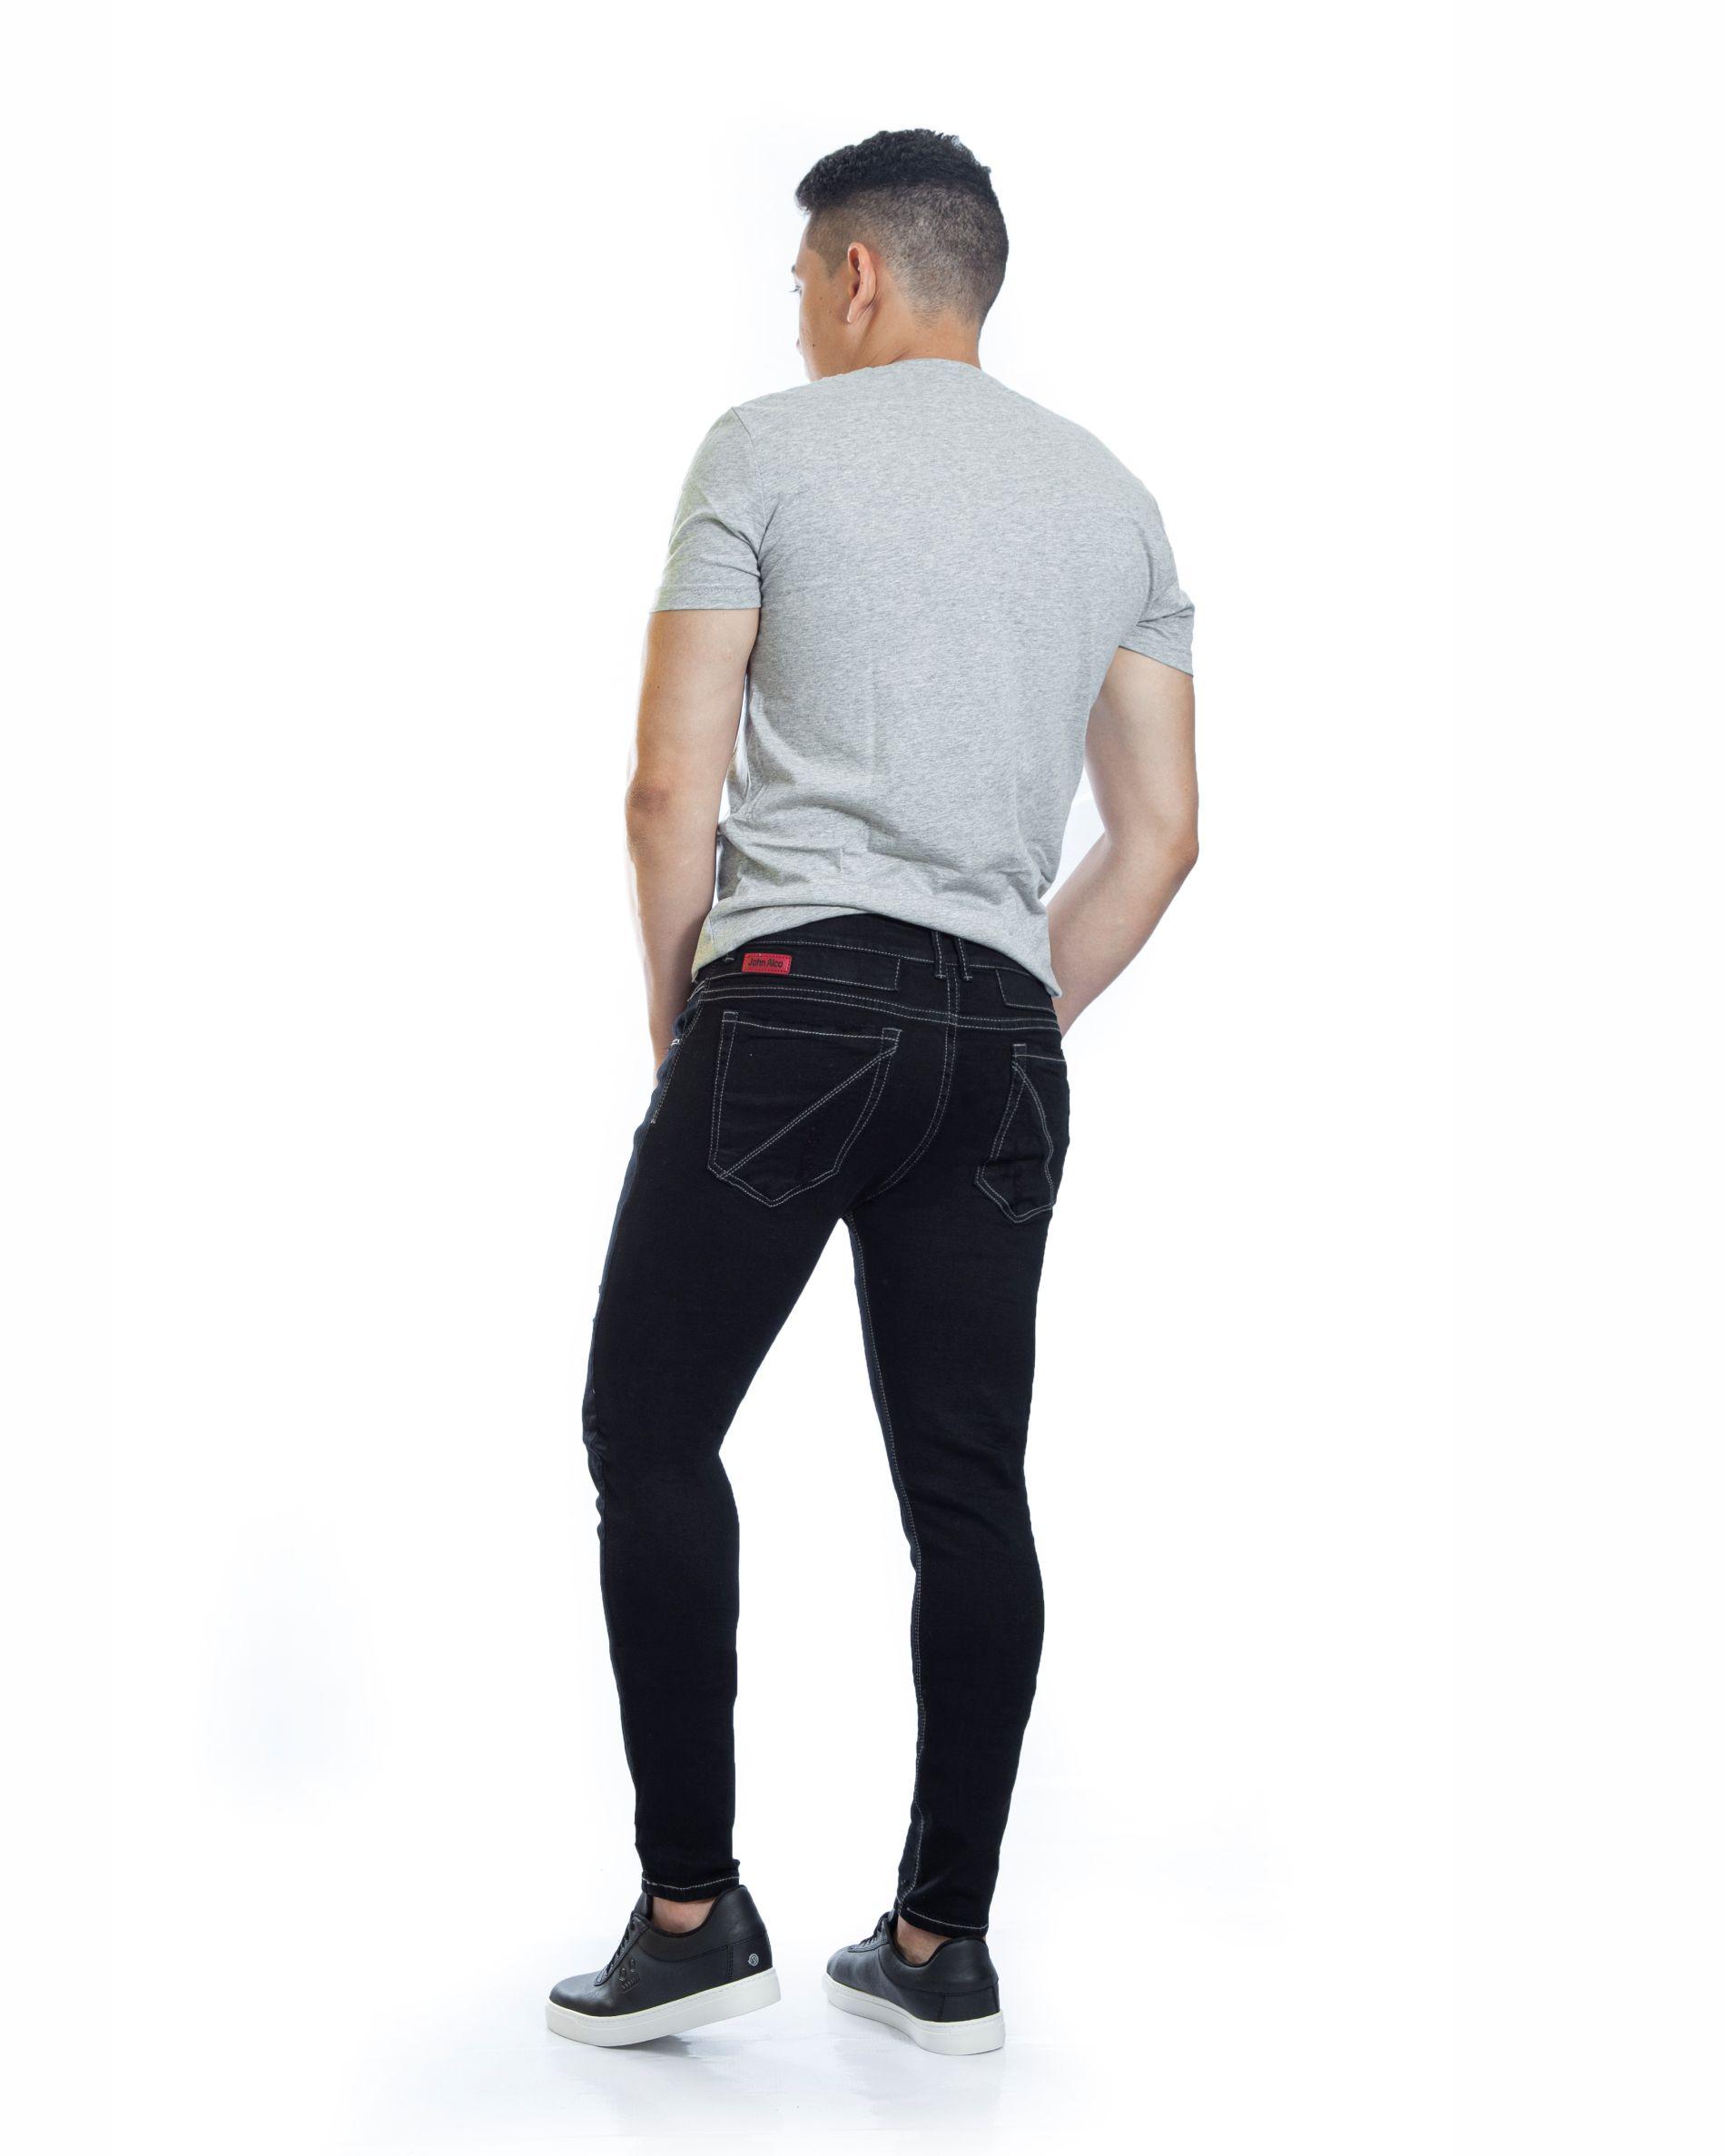 ref 1735 2 jean Black Red , tela jean en algodon 98% + 2% expande. talla 26 28 30 32 34 36 $98.000